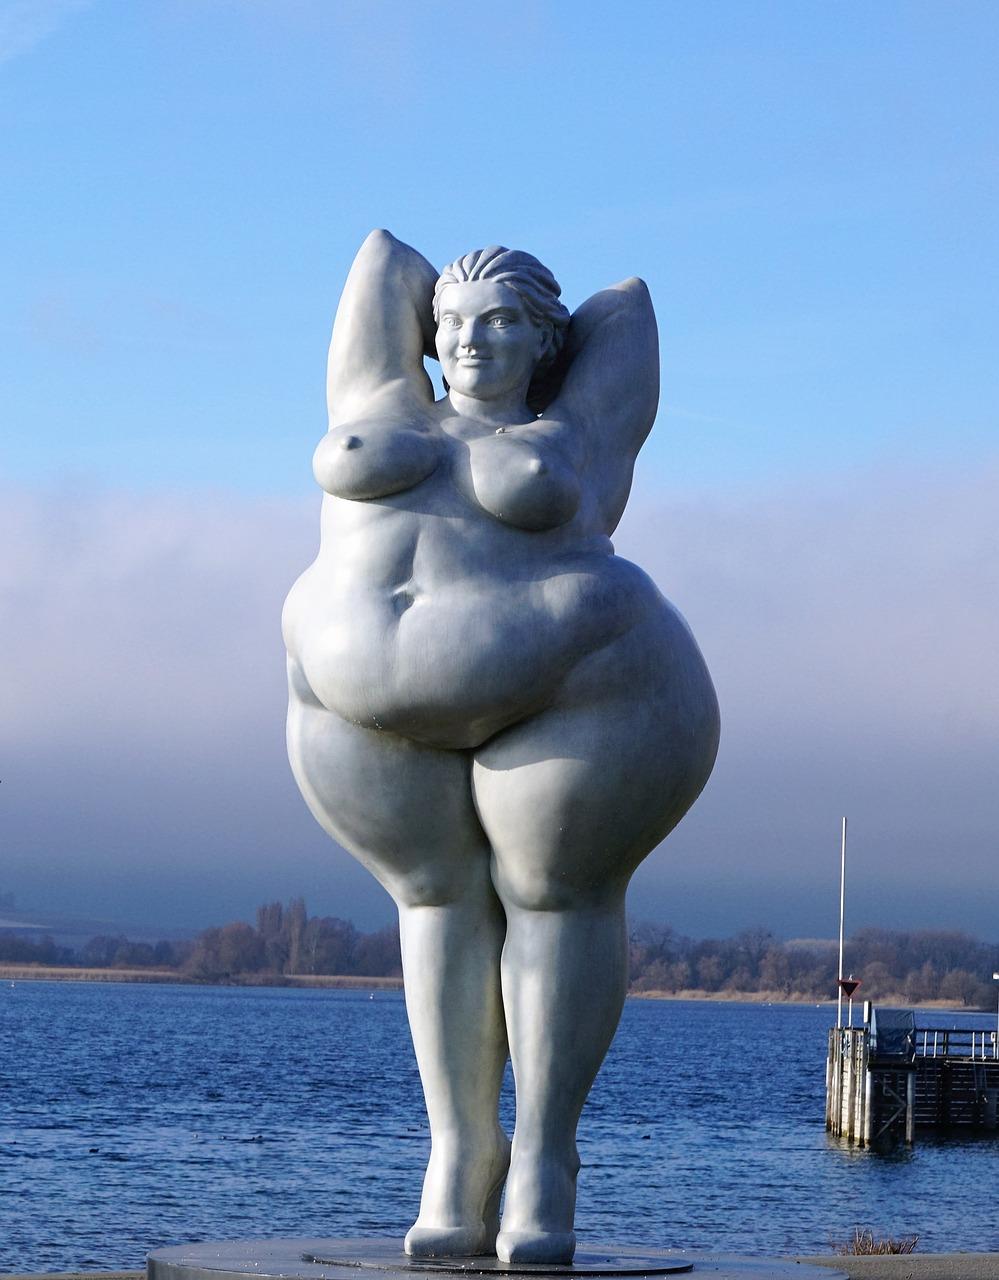 Statue of an overweight woman or aka, goddess statue body shaming illness shaming new age spirituality